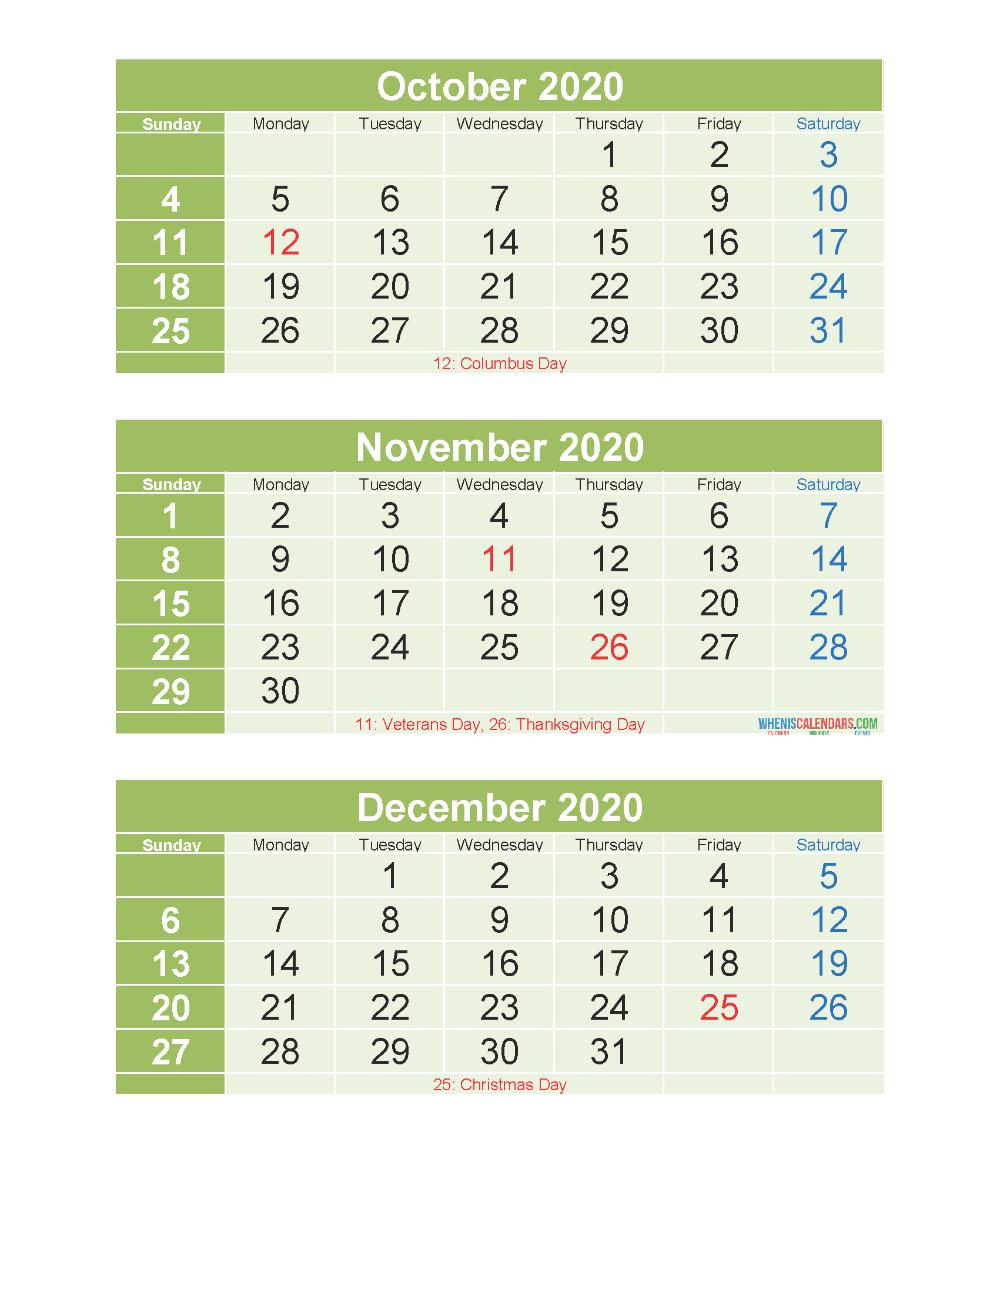 Free Printable 3 Month Calendar 2020 Oct Nov Dec Pdf, Excel throughout 3 Month Calendar 2020 Excel